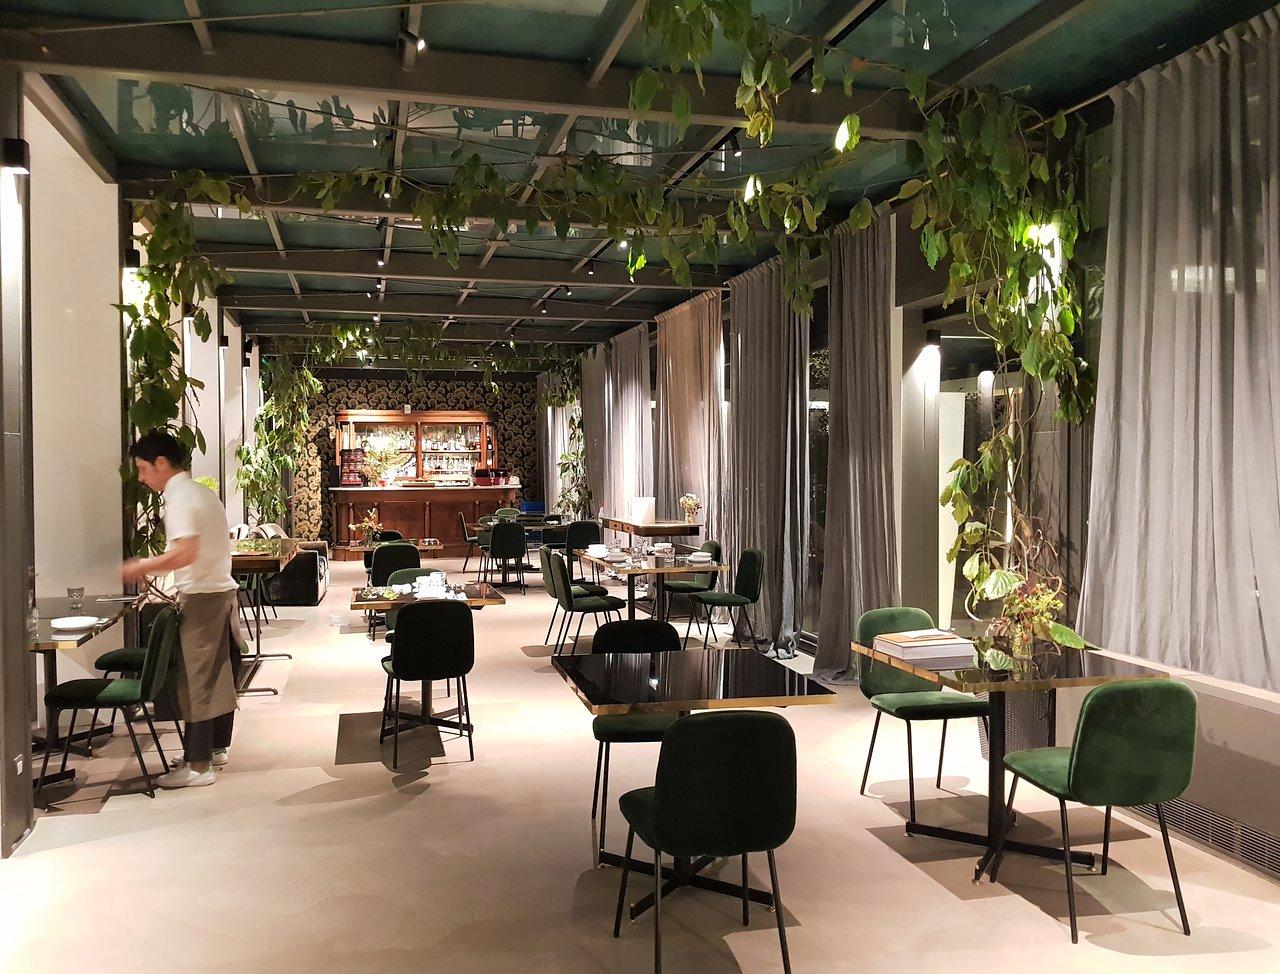 Hotel Borgo Nuovo : Hotel borgo nuovo bewertungen fotos preisvergleich mailand